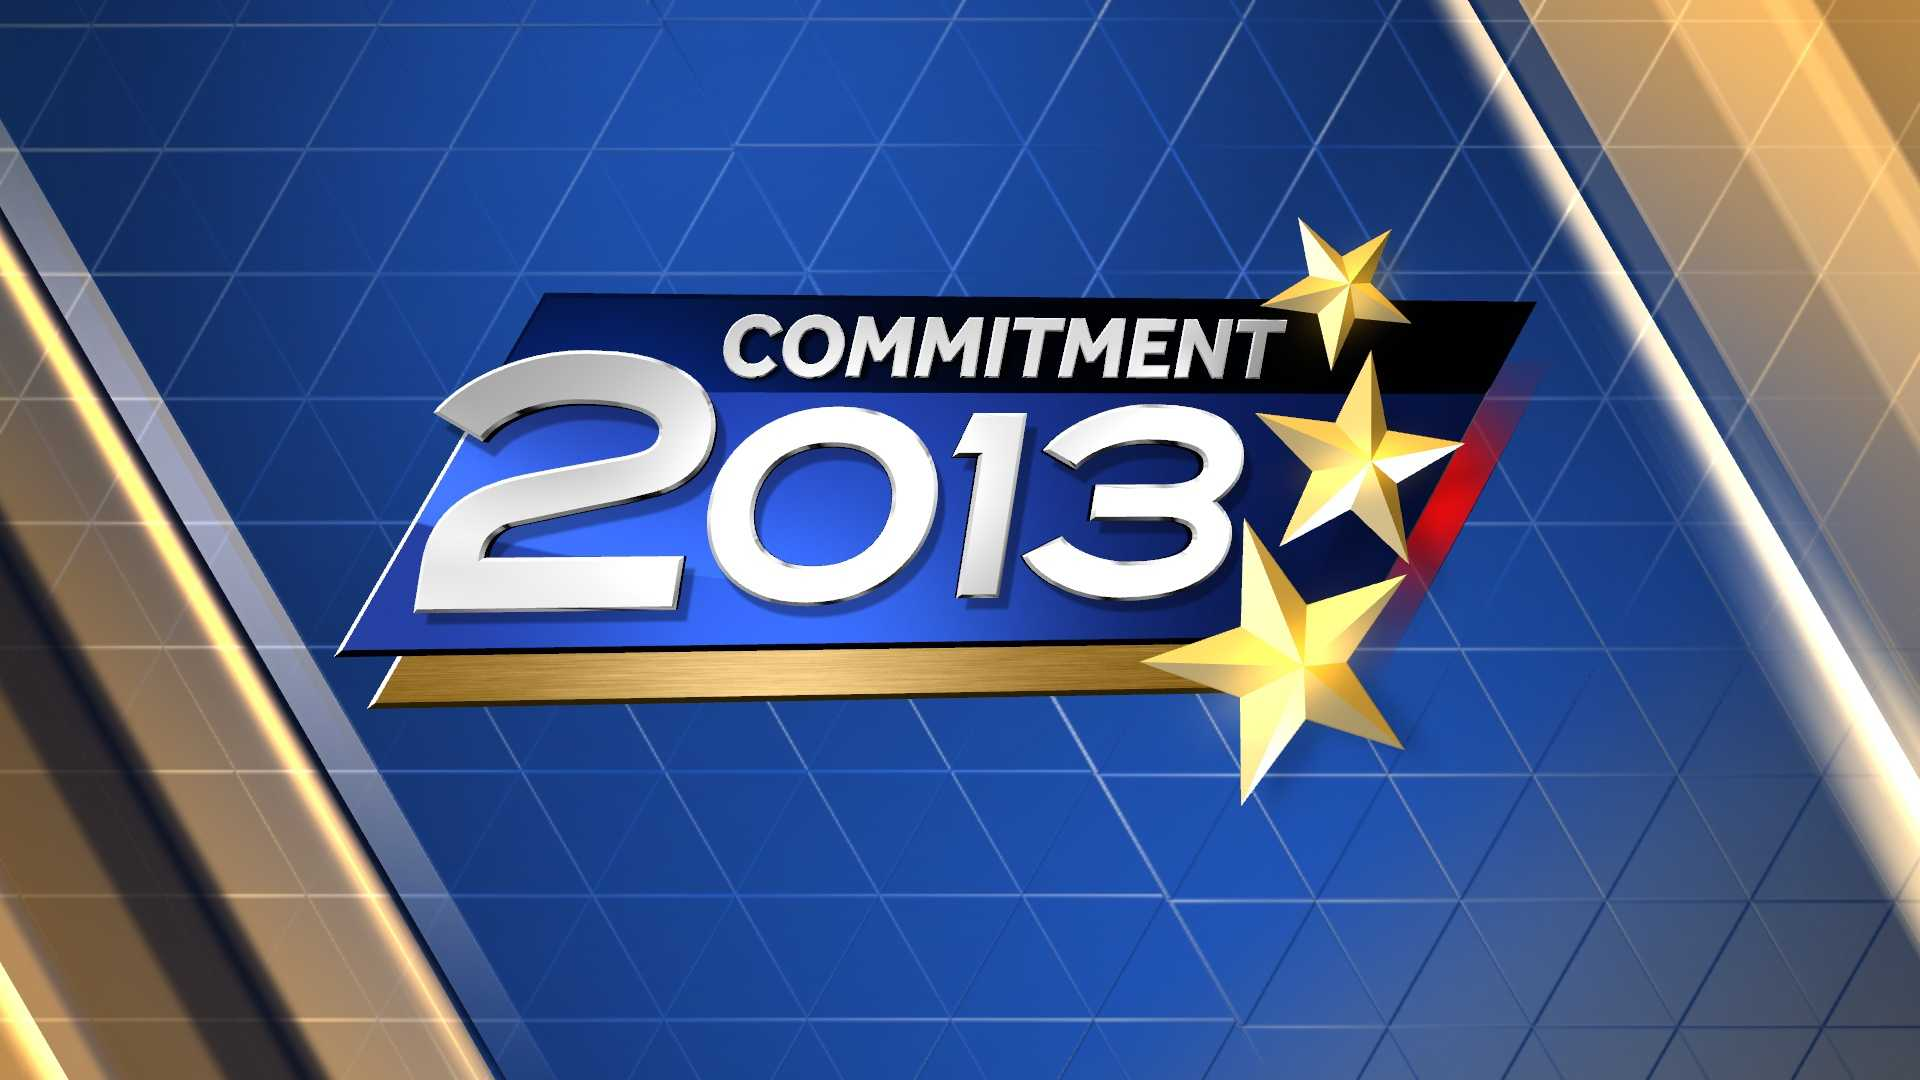 Commitment-2013